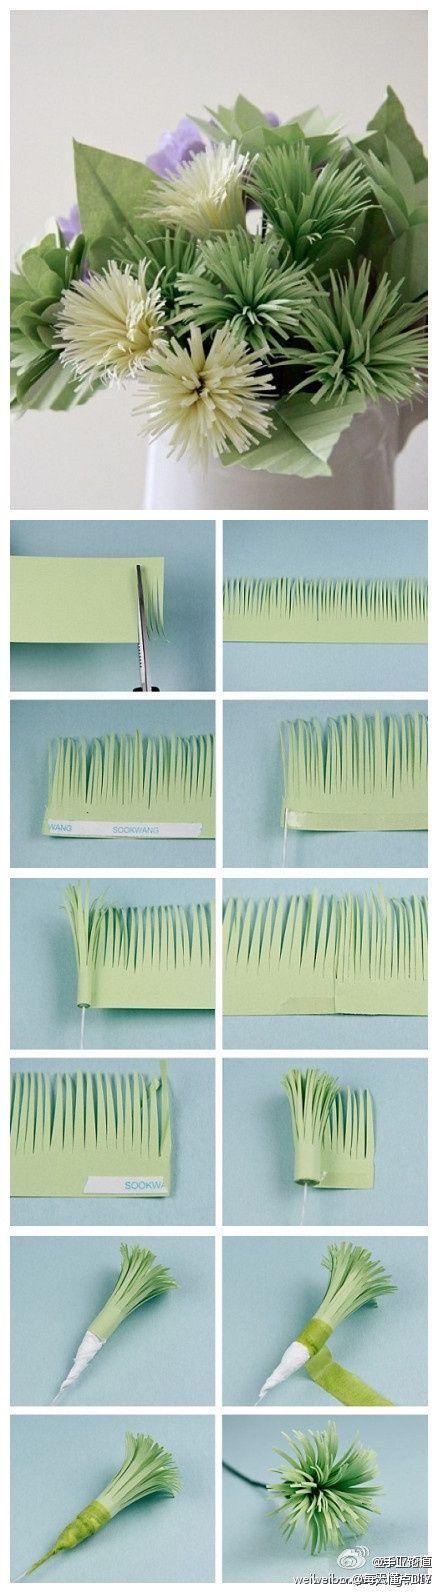 Homemade paper flowers